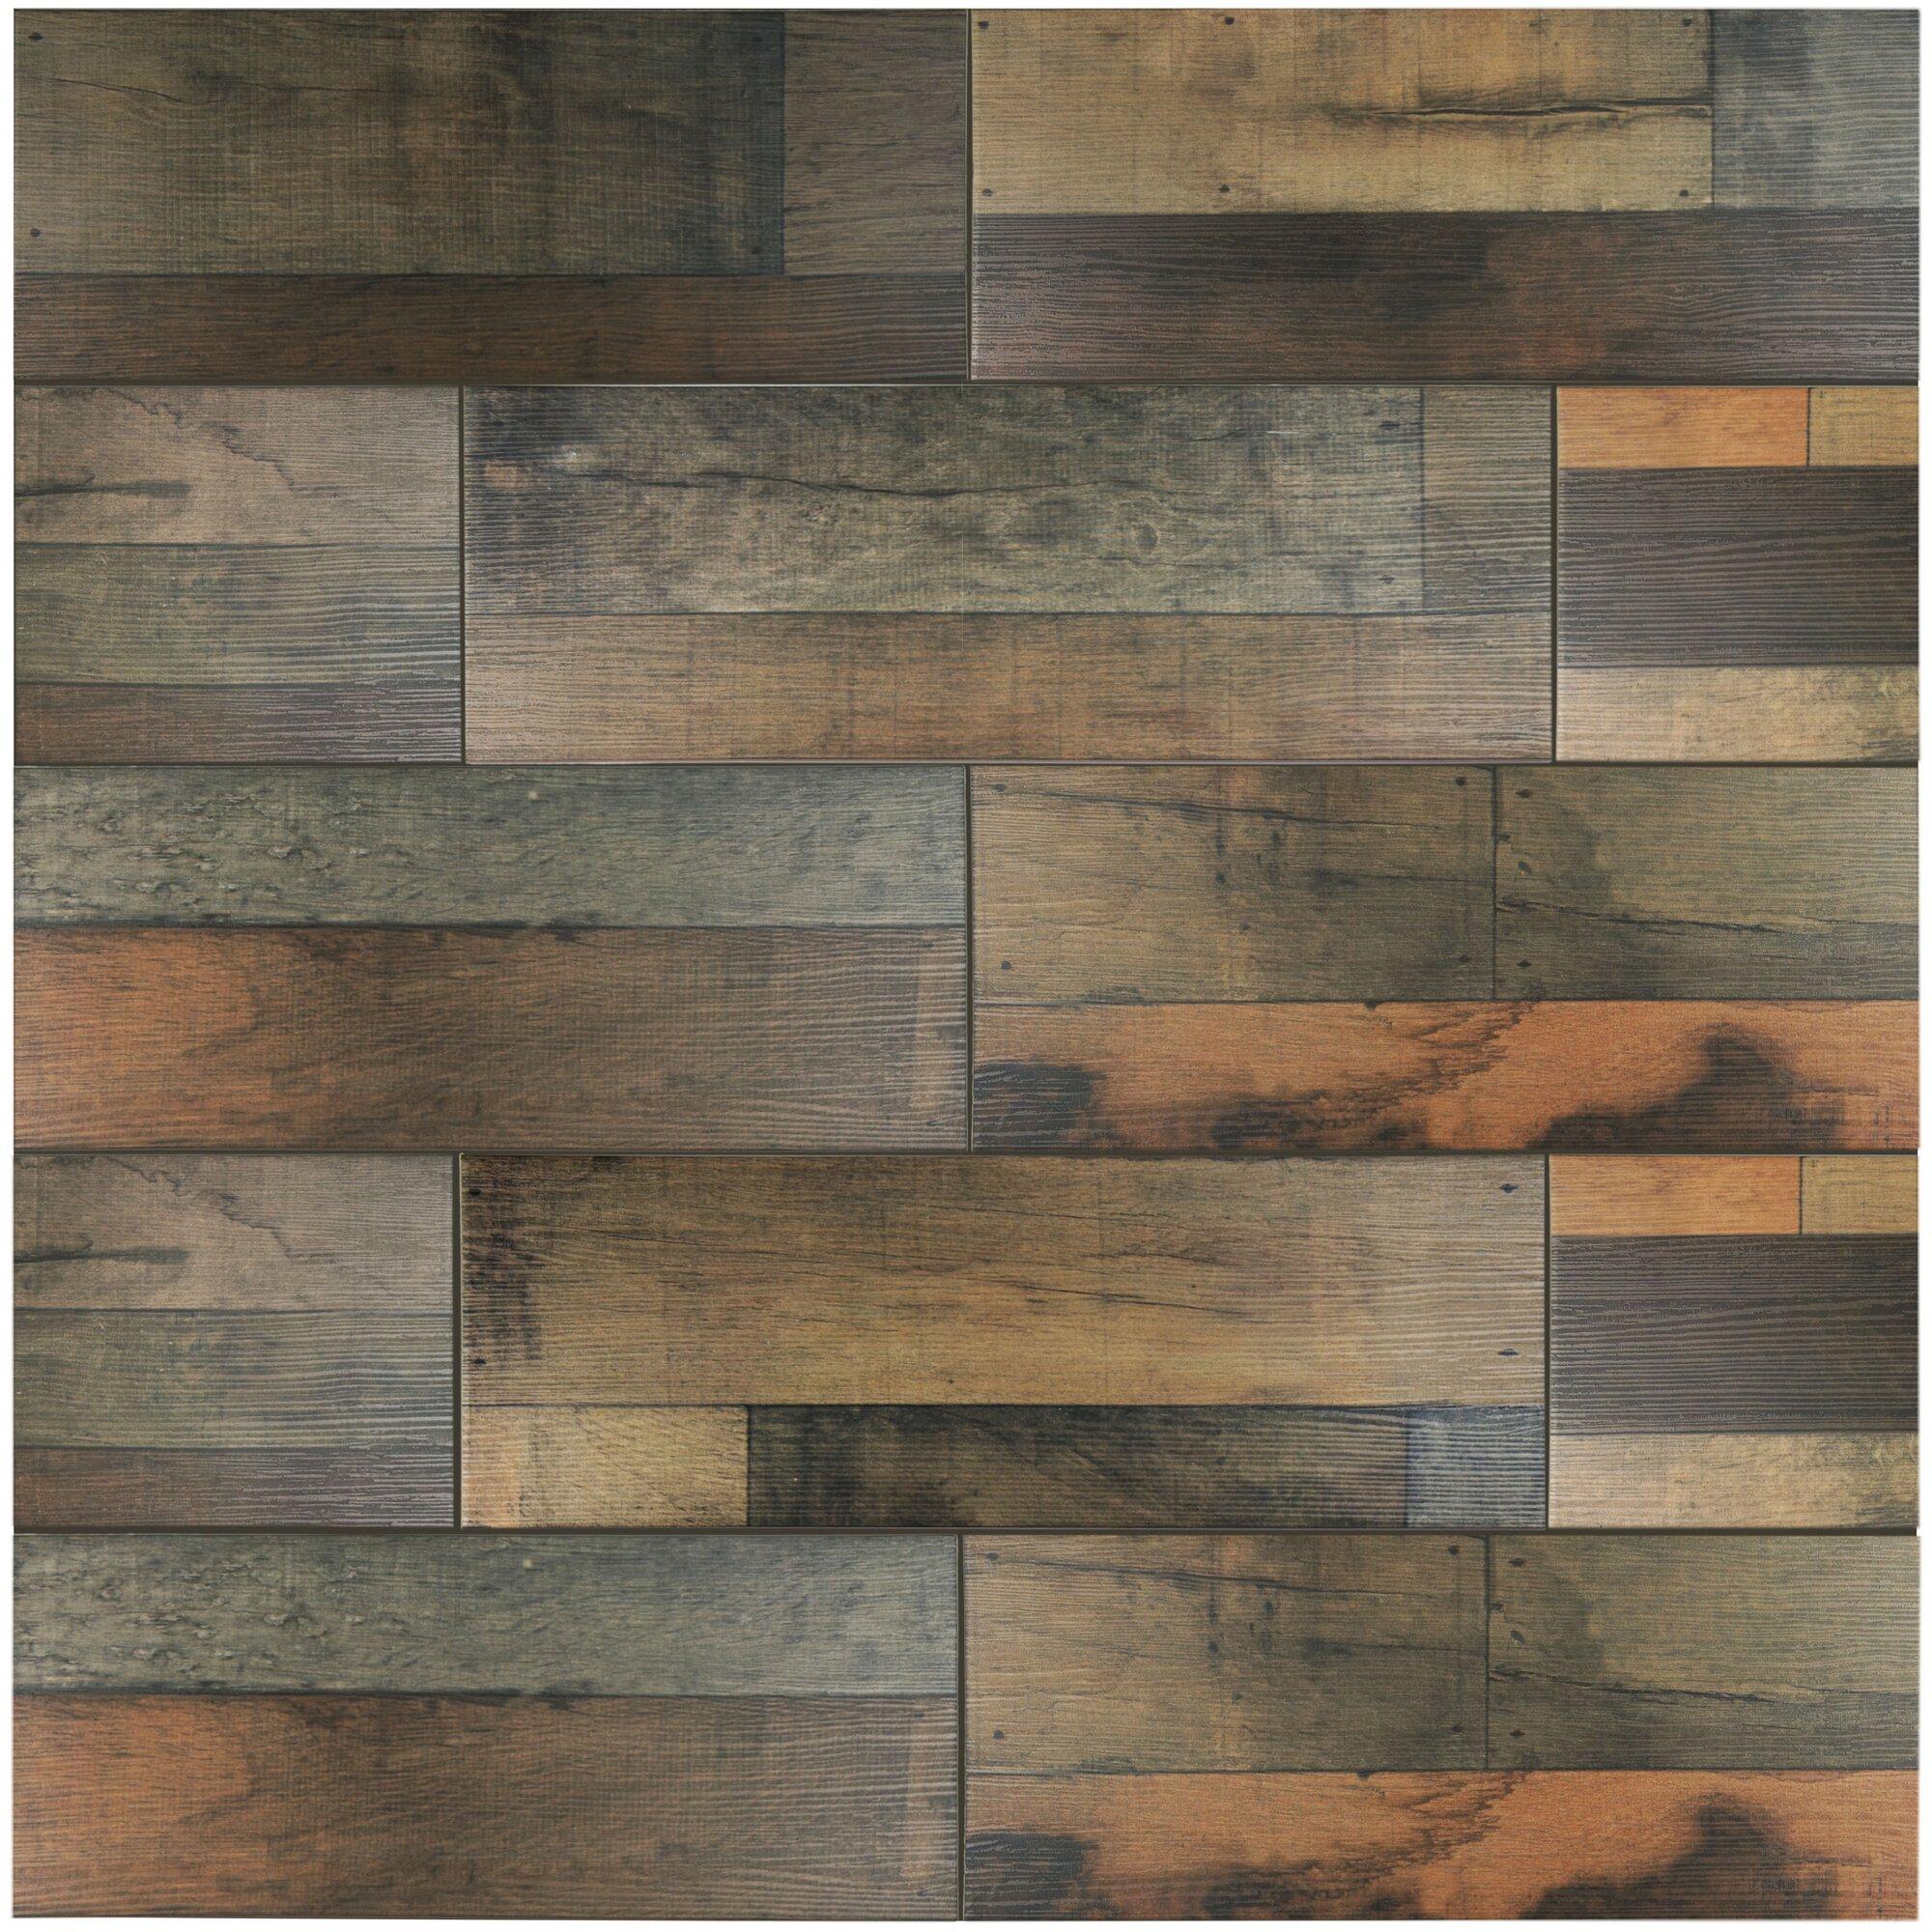 Floor Tile Patterns 12x24 Flooring Ideas and Inspiration